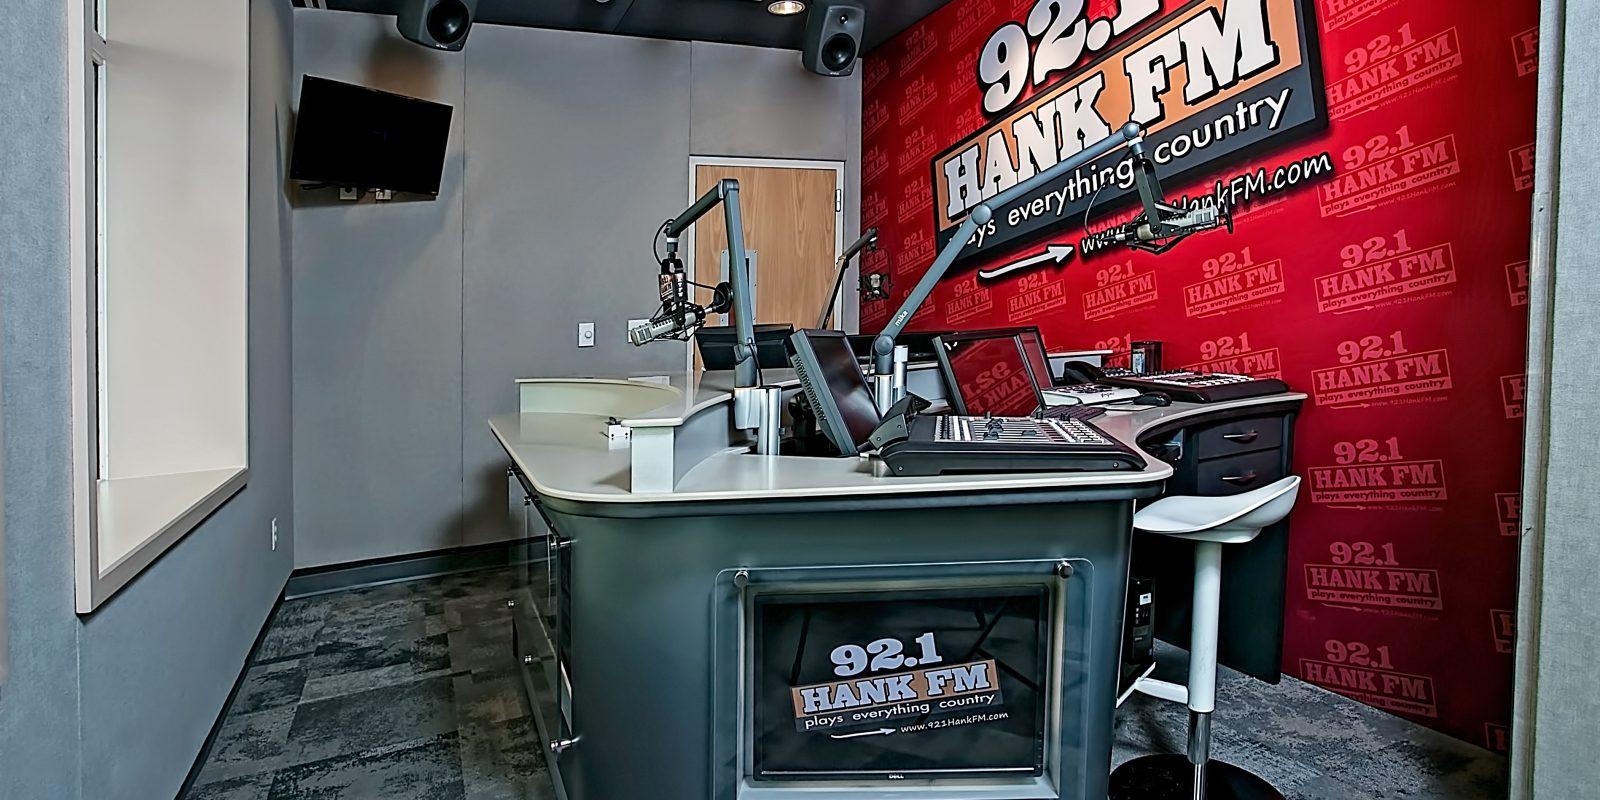 95.9 The Ranch Radio